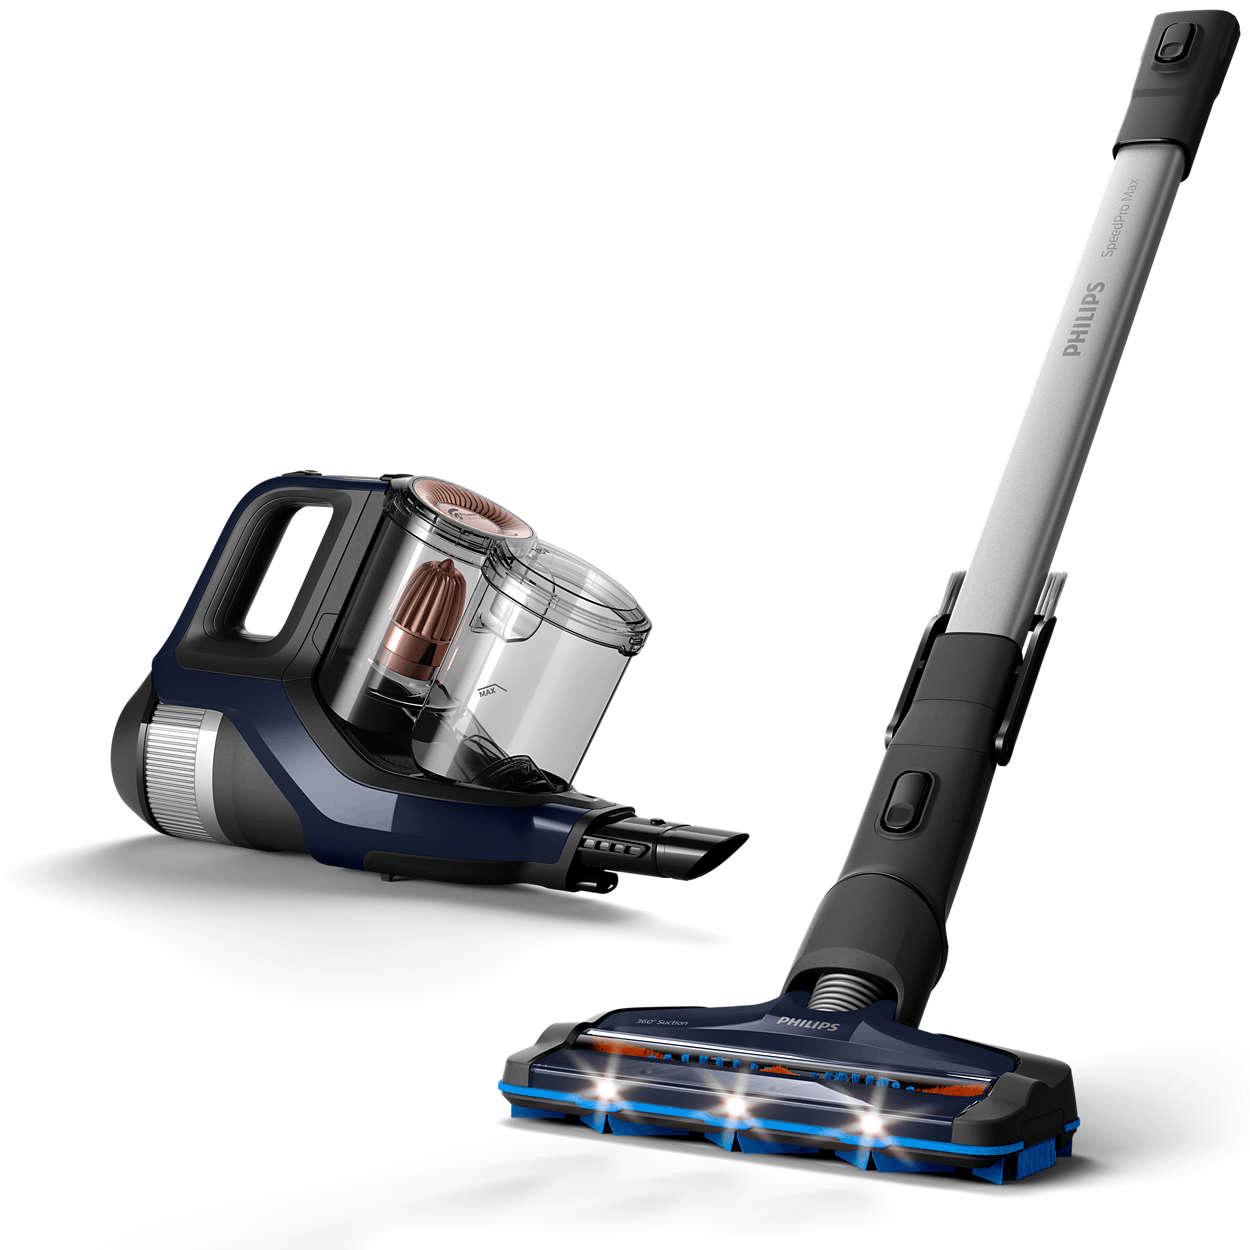 philips handheld cordless vacuum cleaner singapore